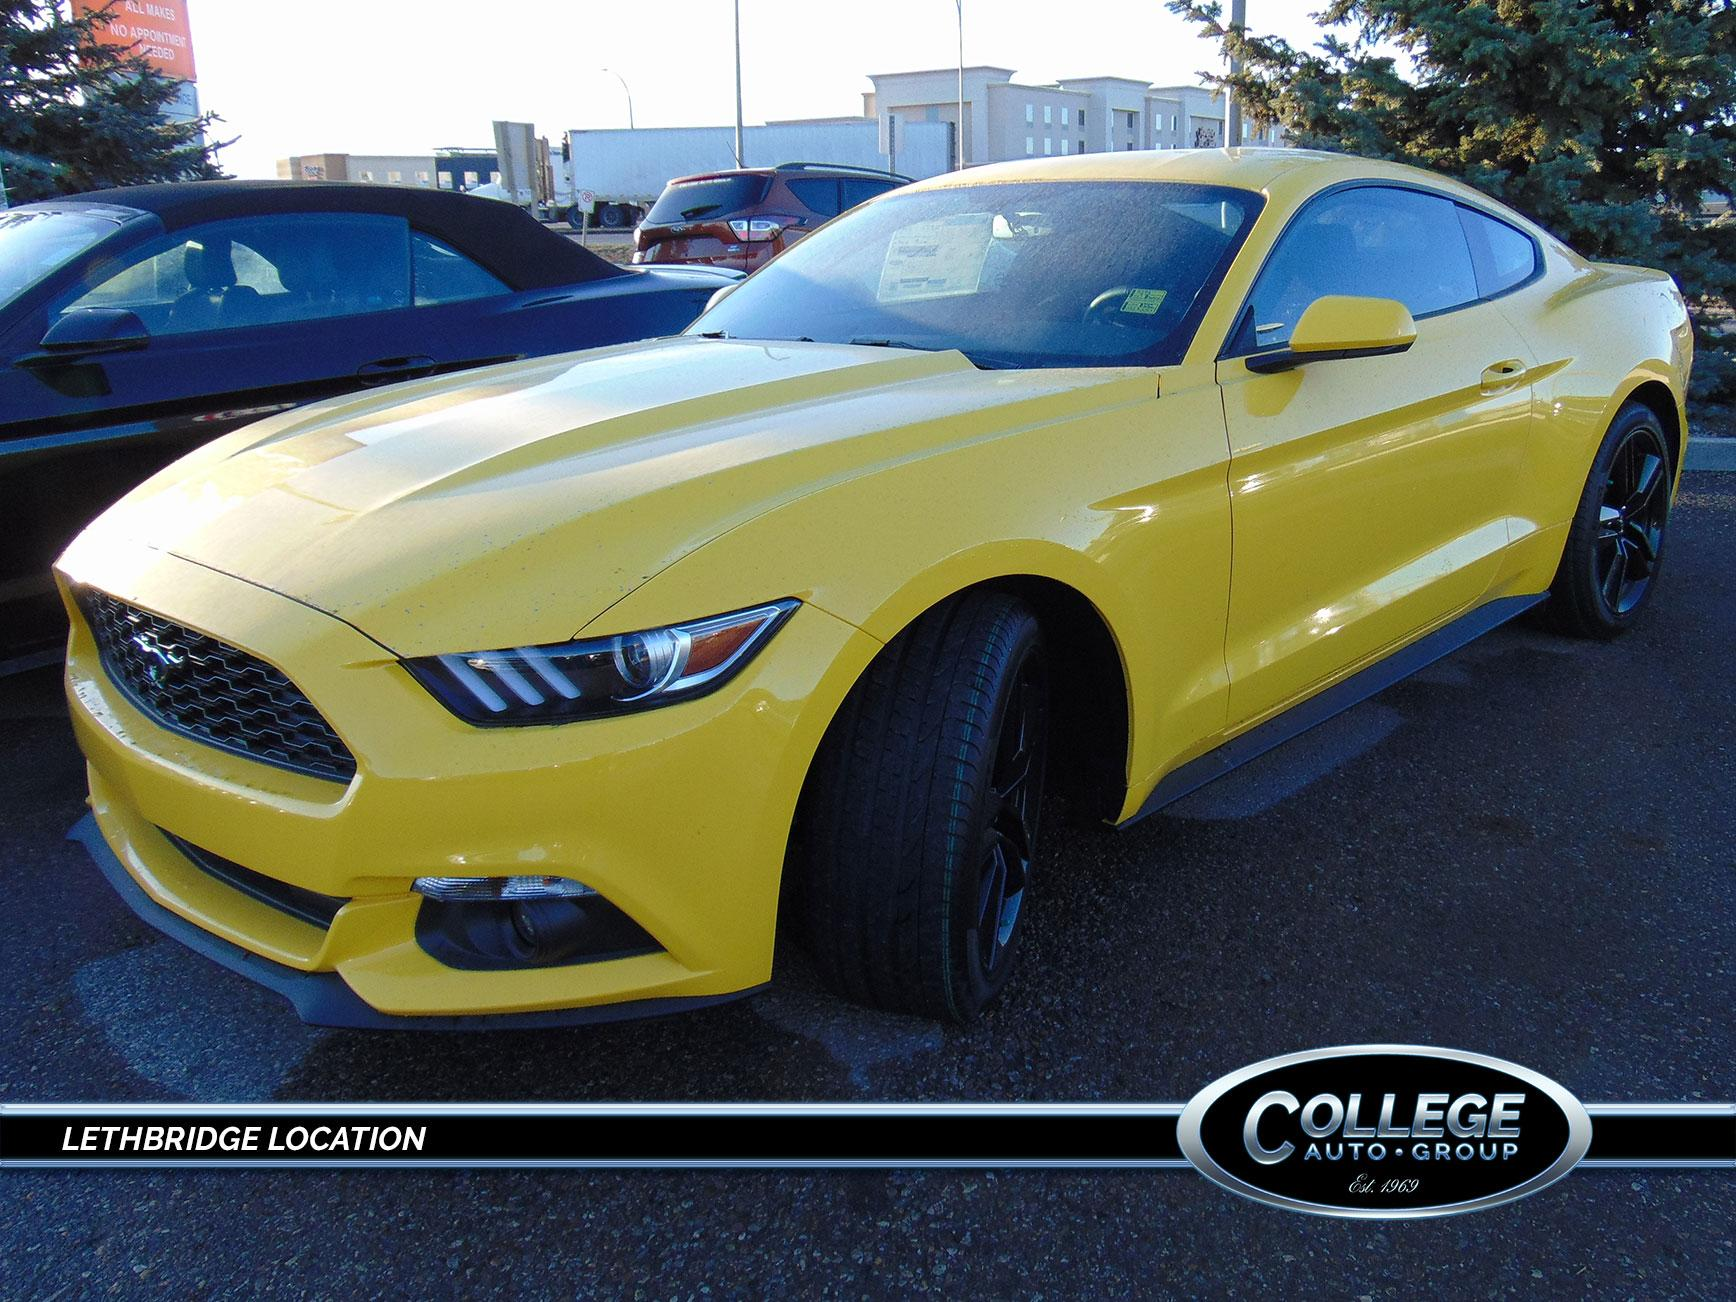 2017 Ford Mustang & New Vehicle Offers   Lethbridge Ford u0026 Lincoln Dealer   College ... markmcfarlin.com